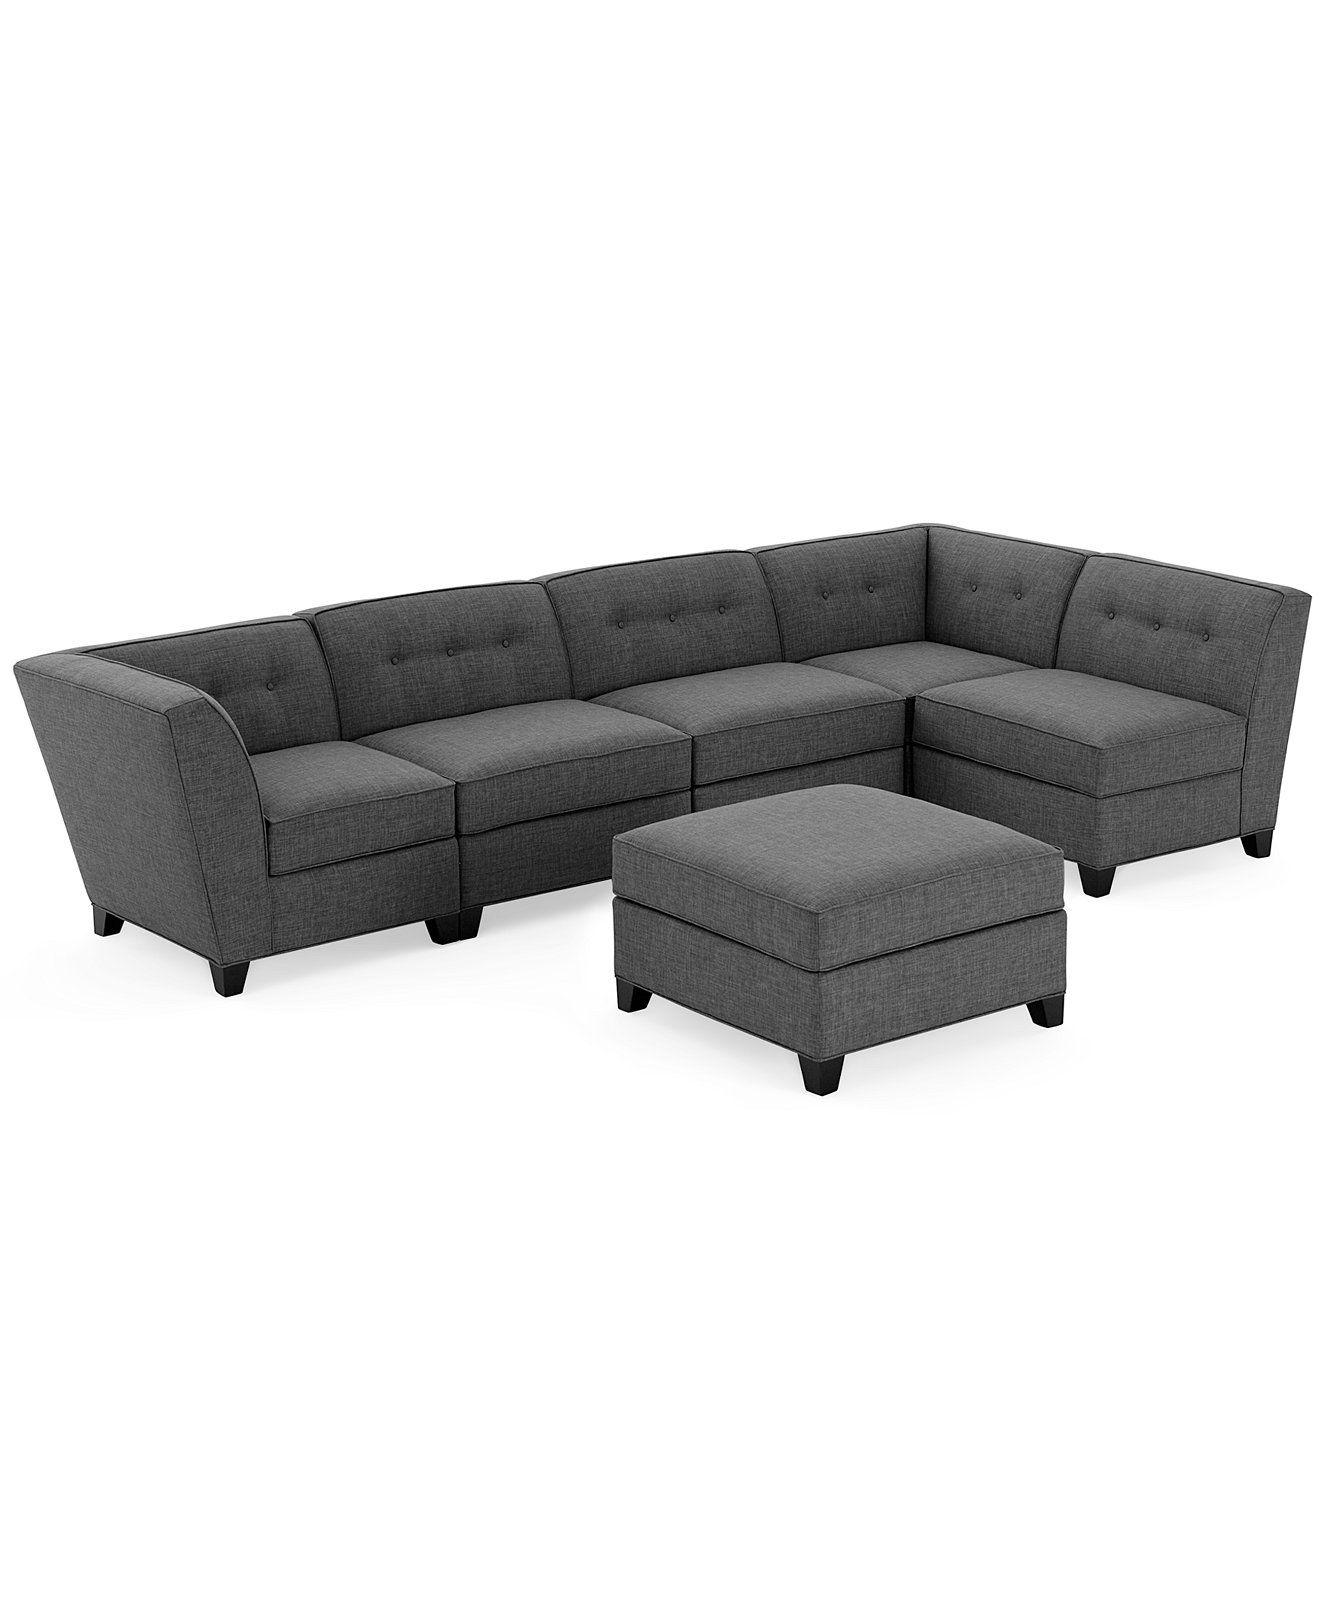 Harper Fabric 6 Piece Modular Sectional Sofa Small Apartment Sleeper 2 Square